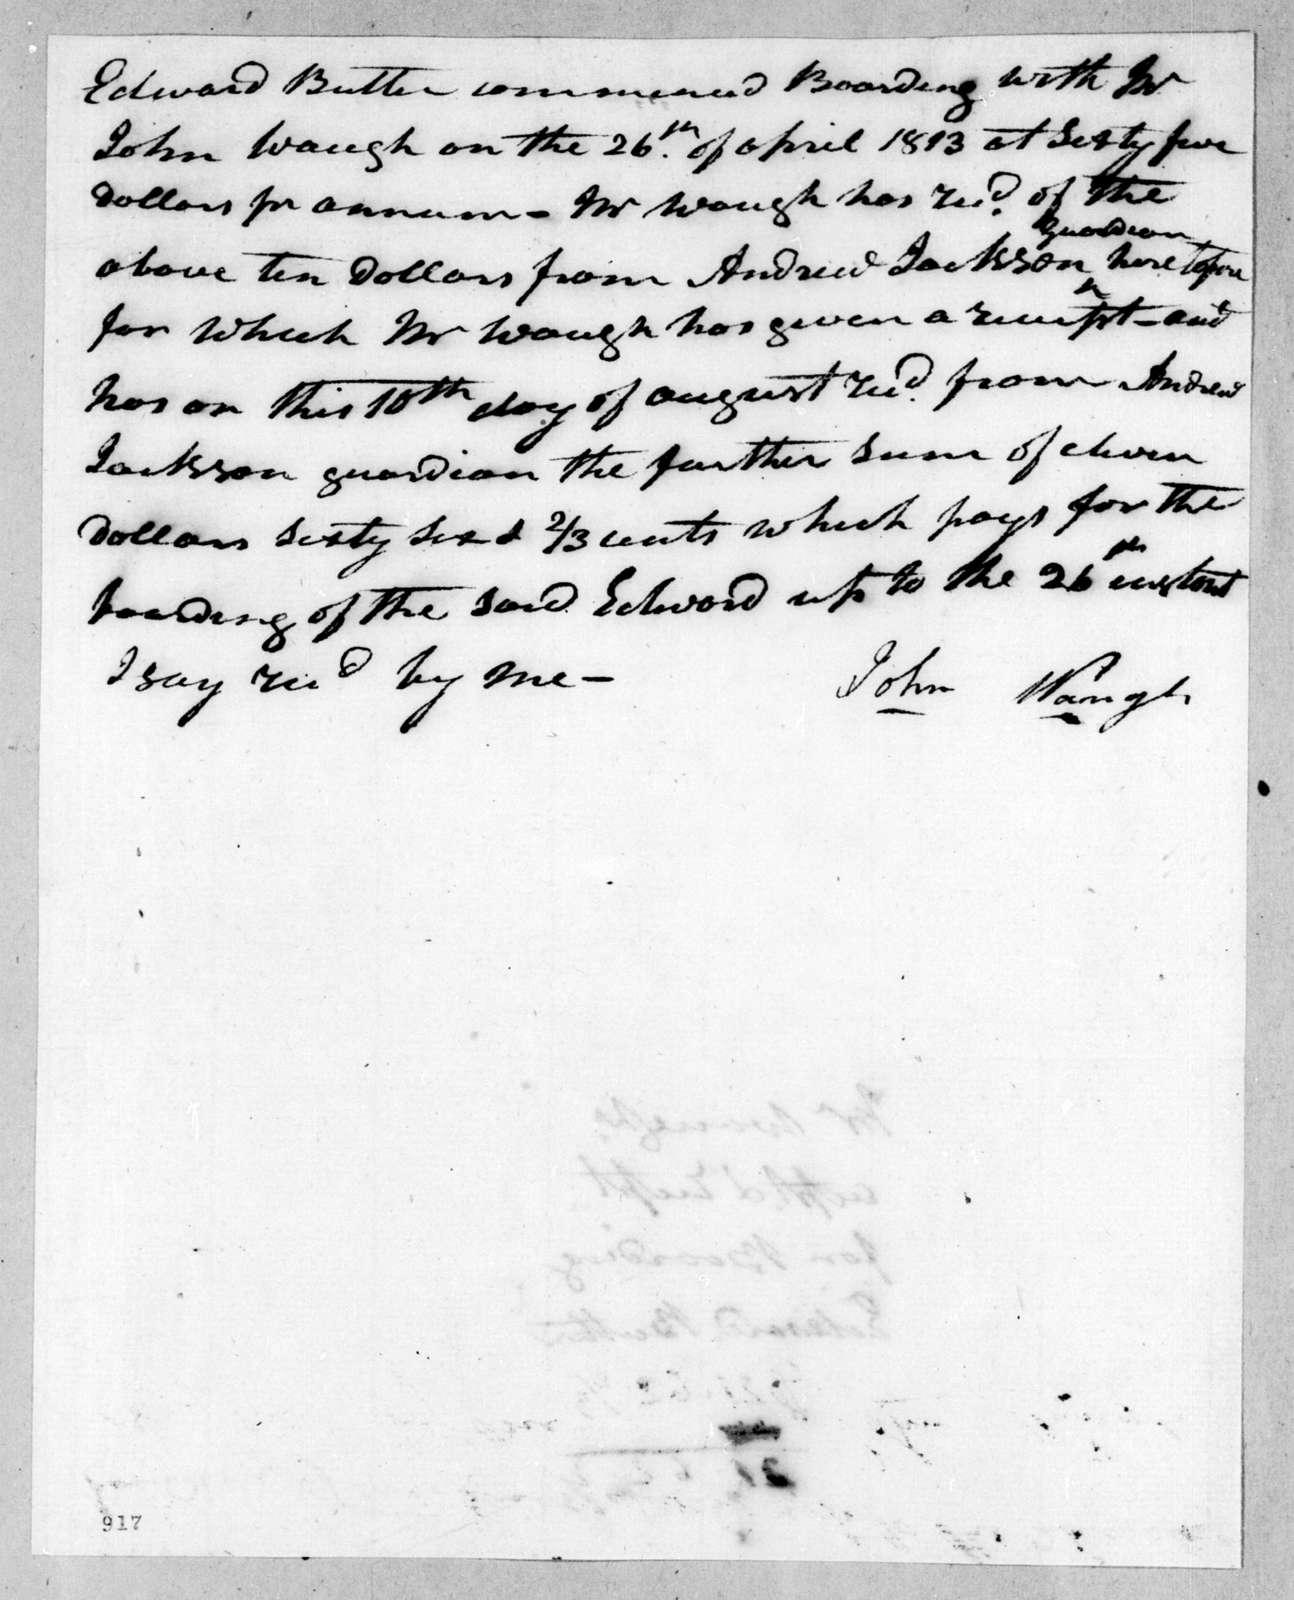 John Waugh to Andrew Jackson, April 26, 1813